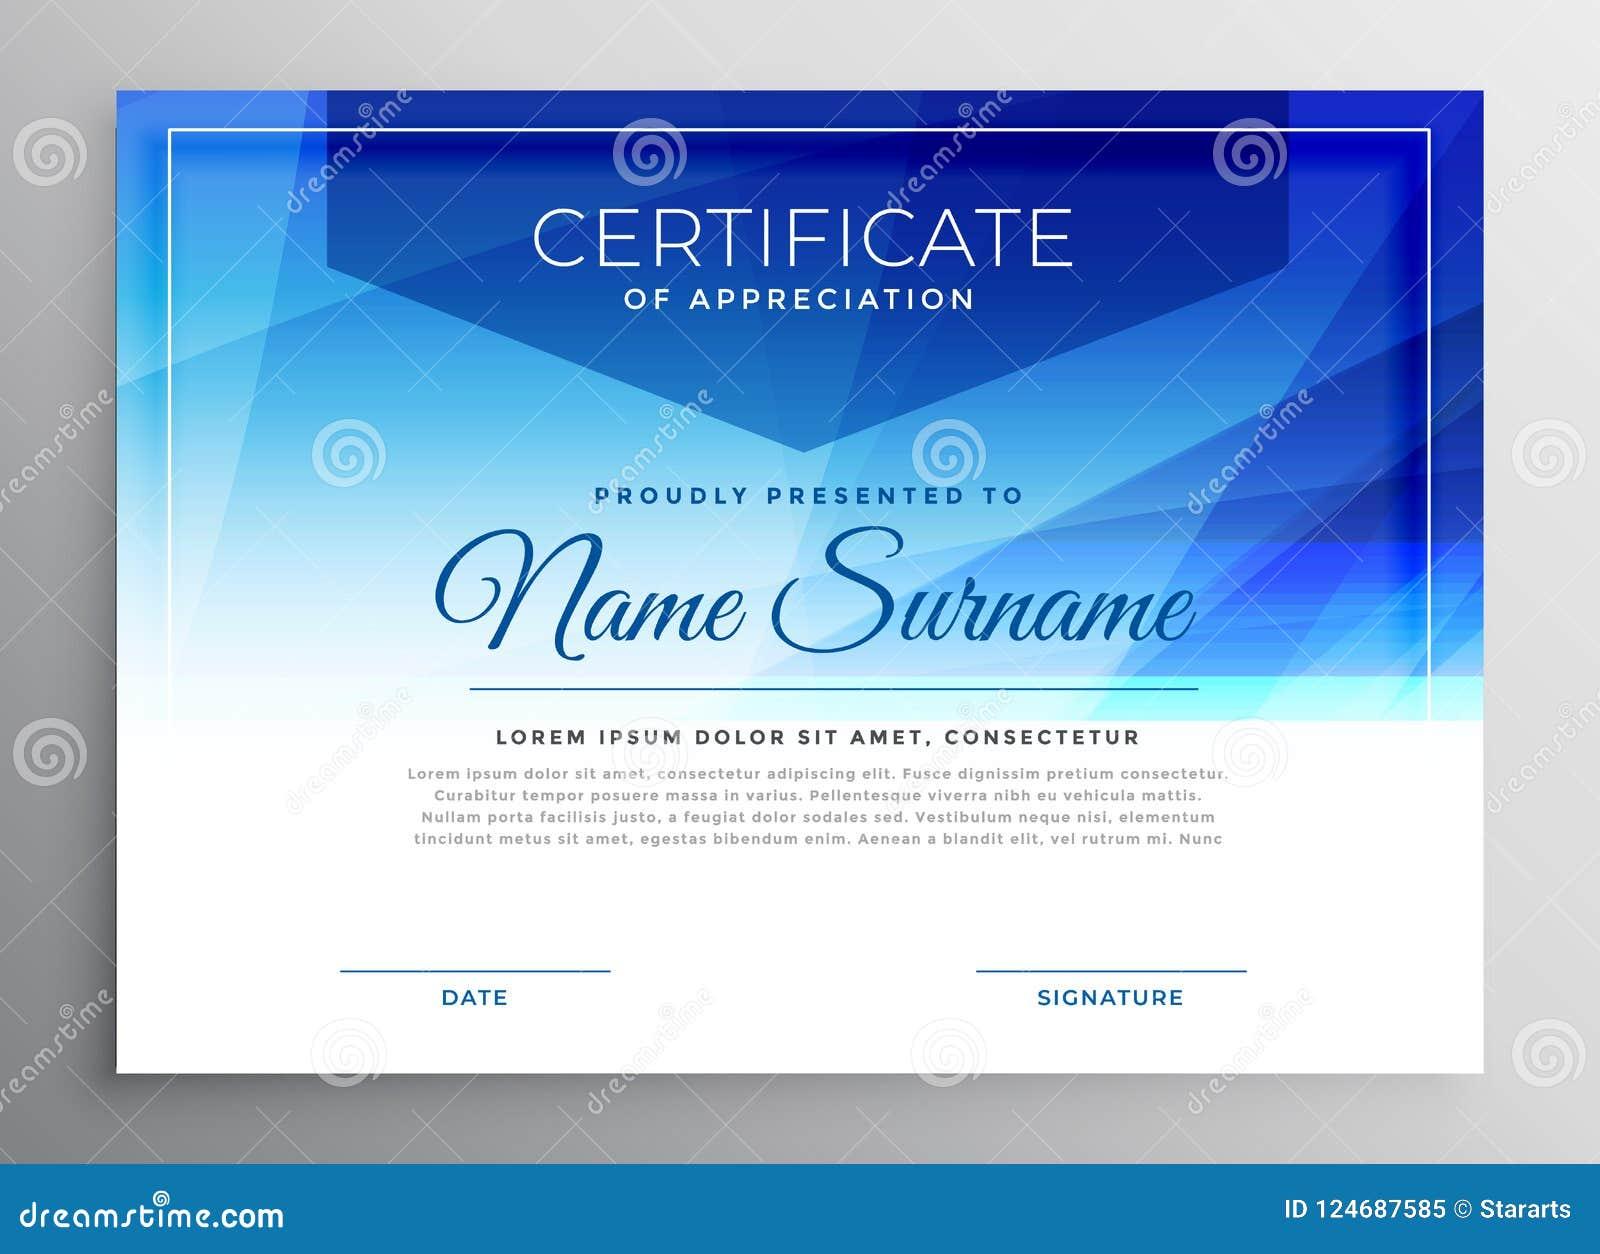 Abstract Blue Award Certificate Design Template Stock Vector Throughout Award Certificate Design Template